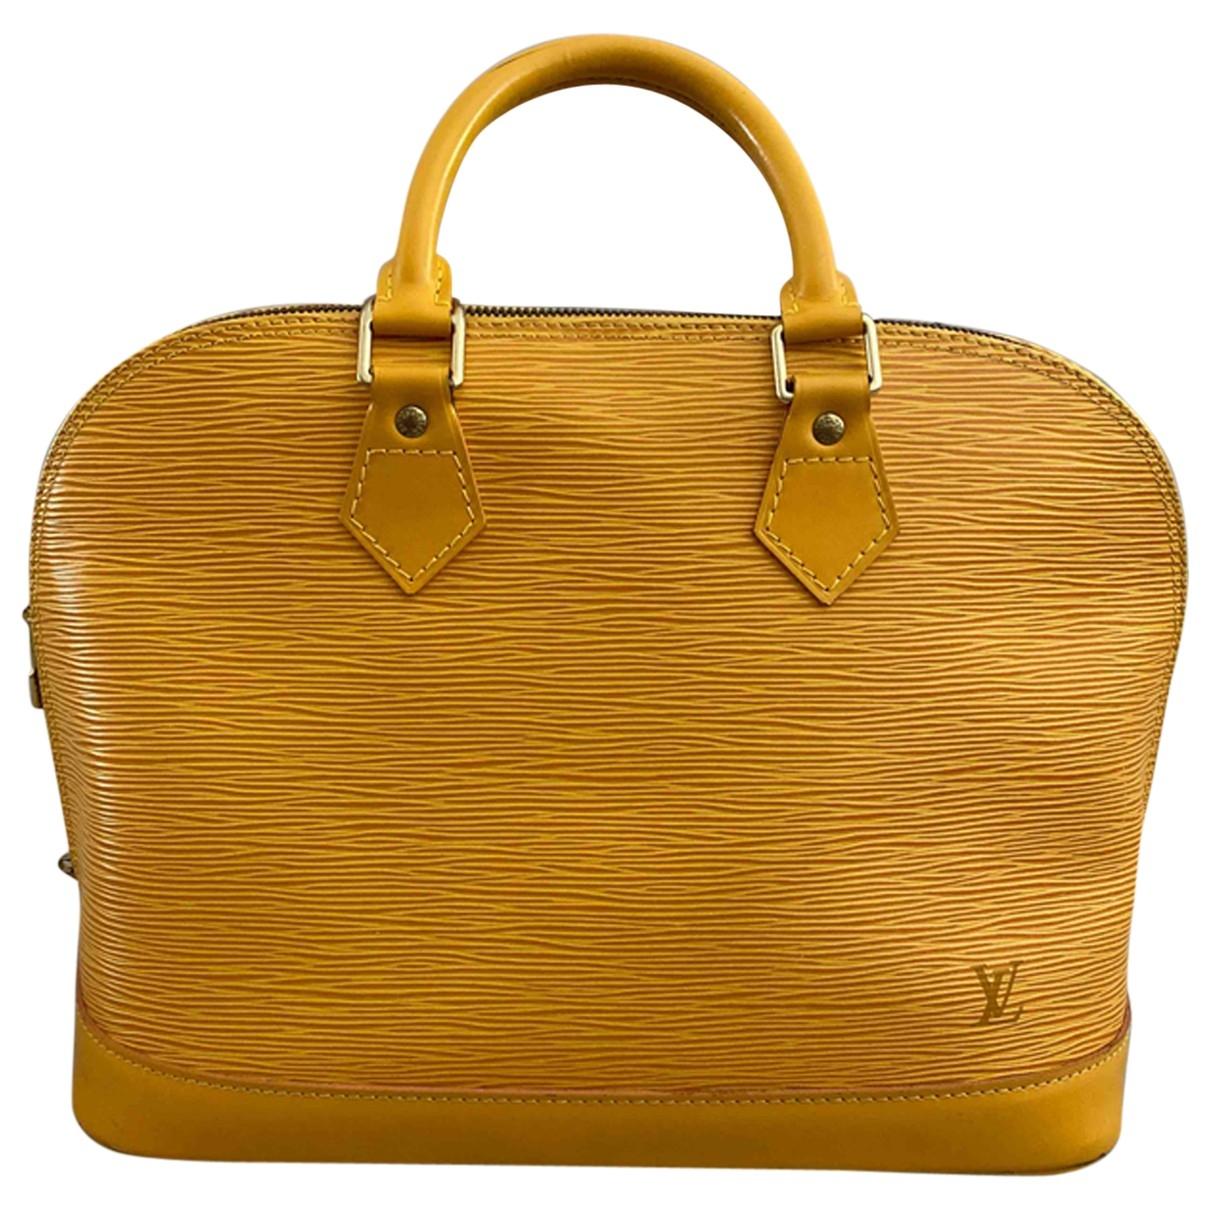 Louis Vuitton Alma BB Yellow Leather handbag for Women \N